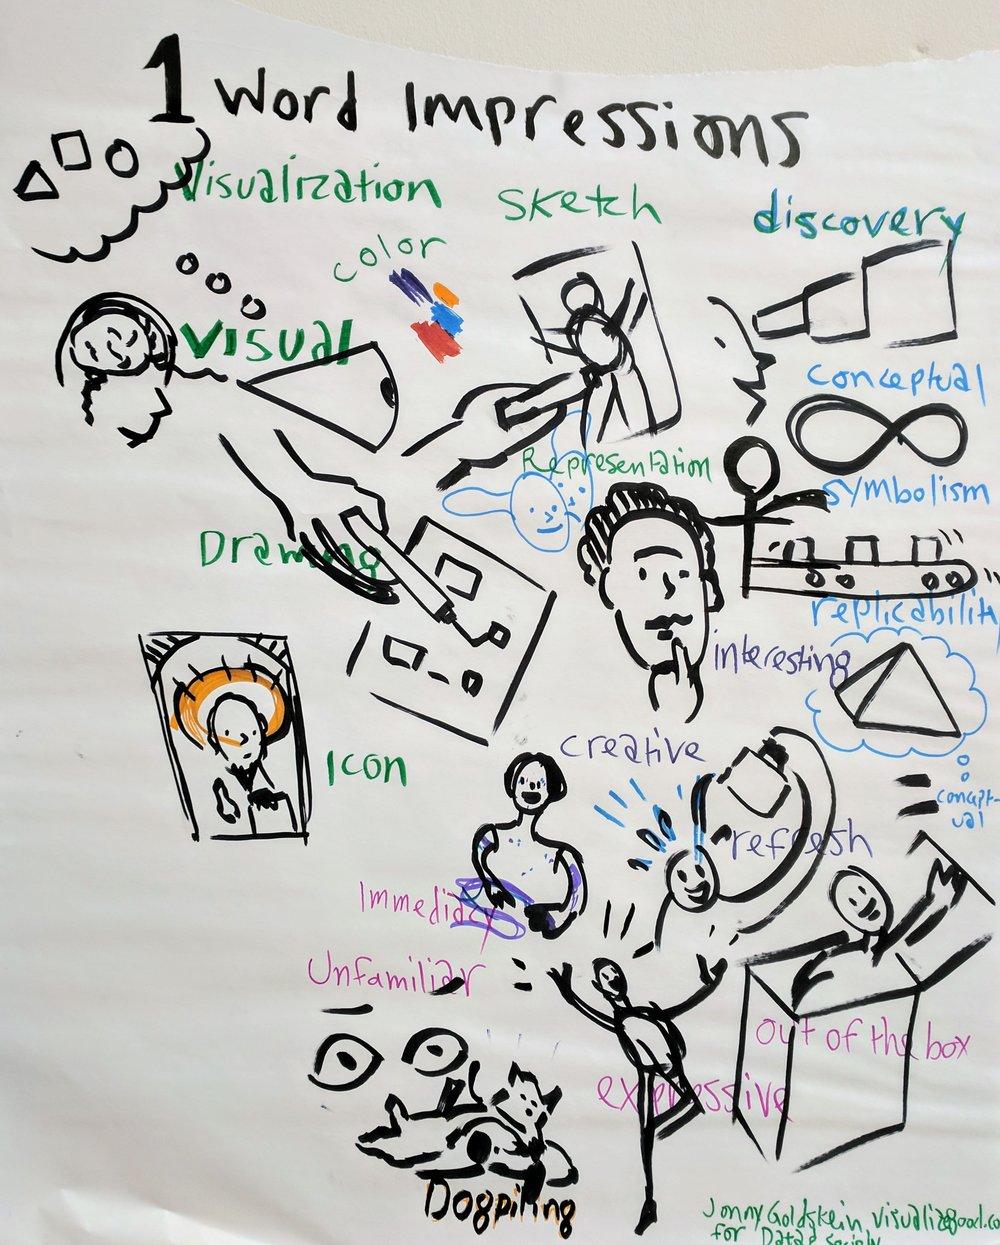 illustratedfeedback-visualizegood.jpg